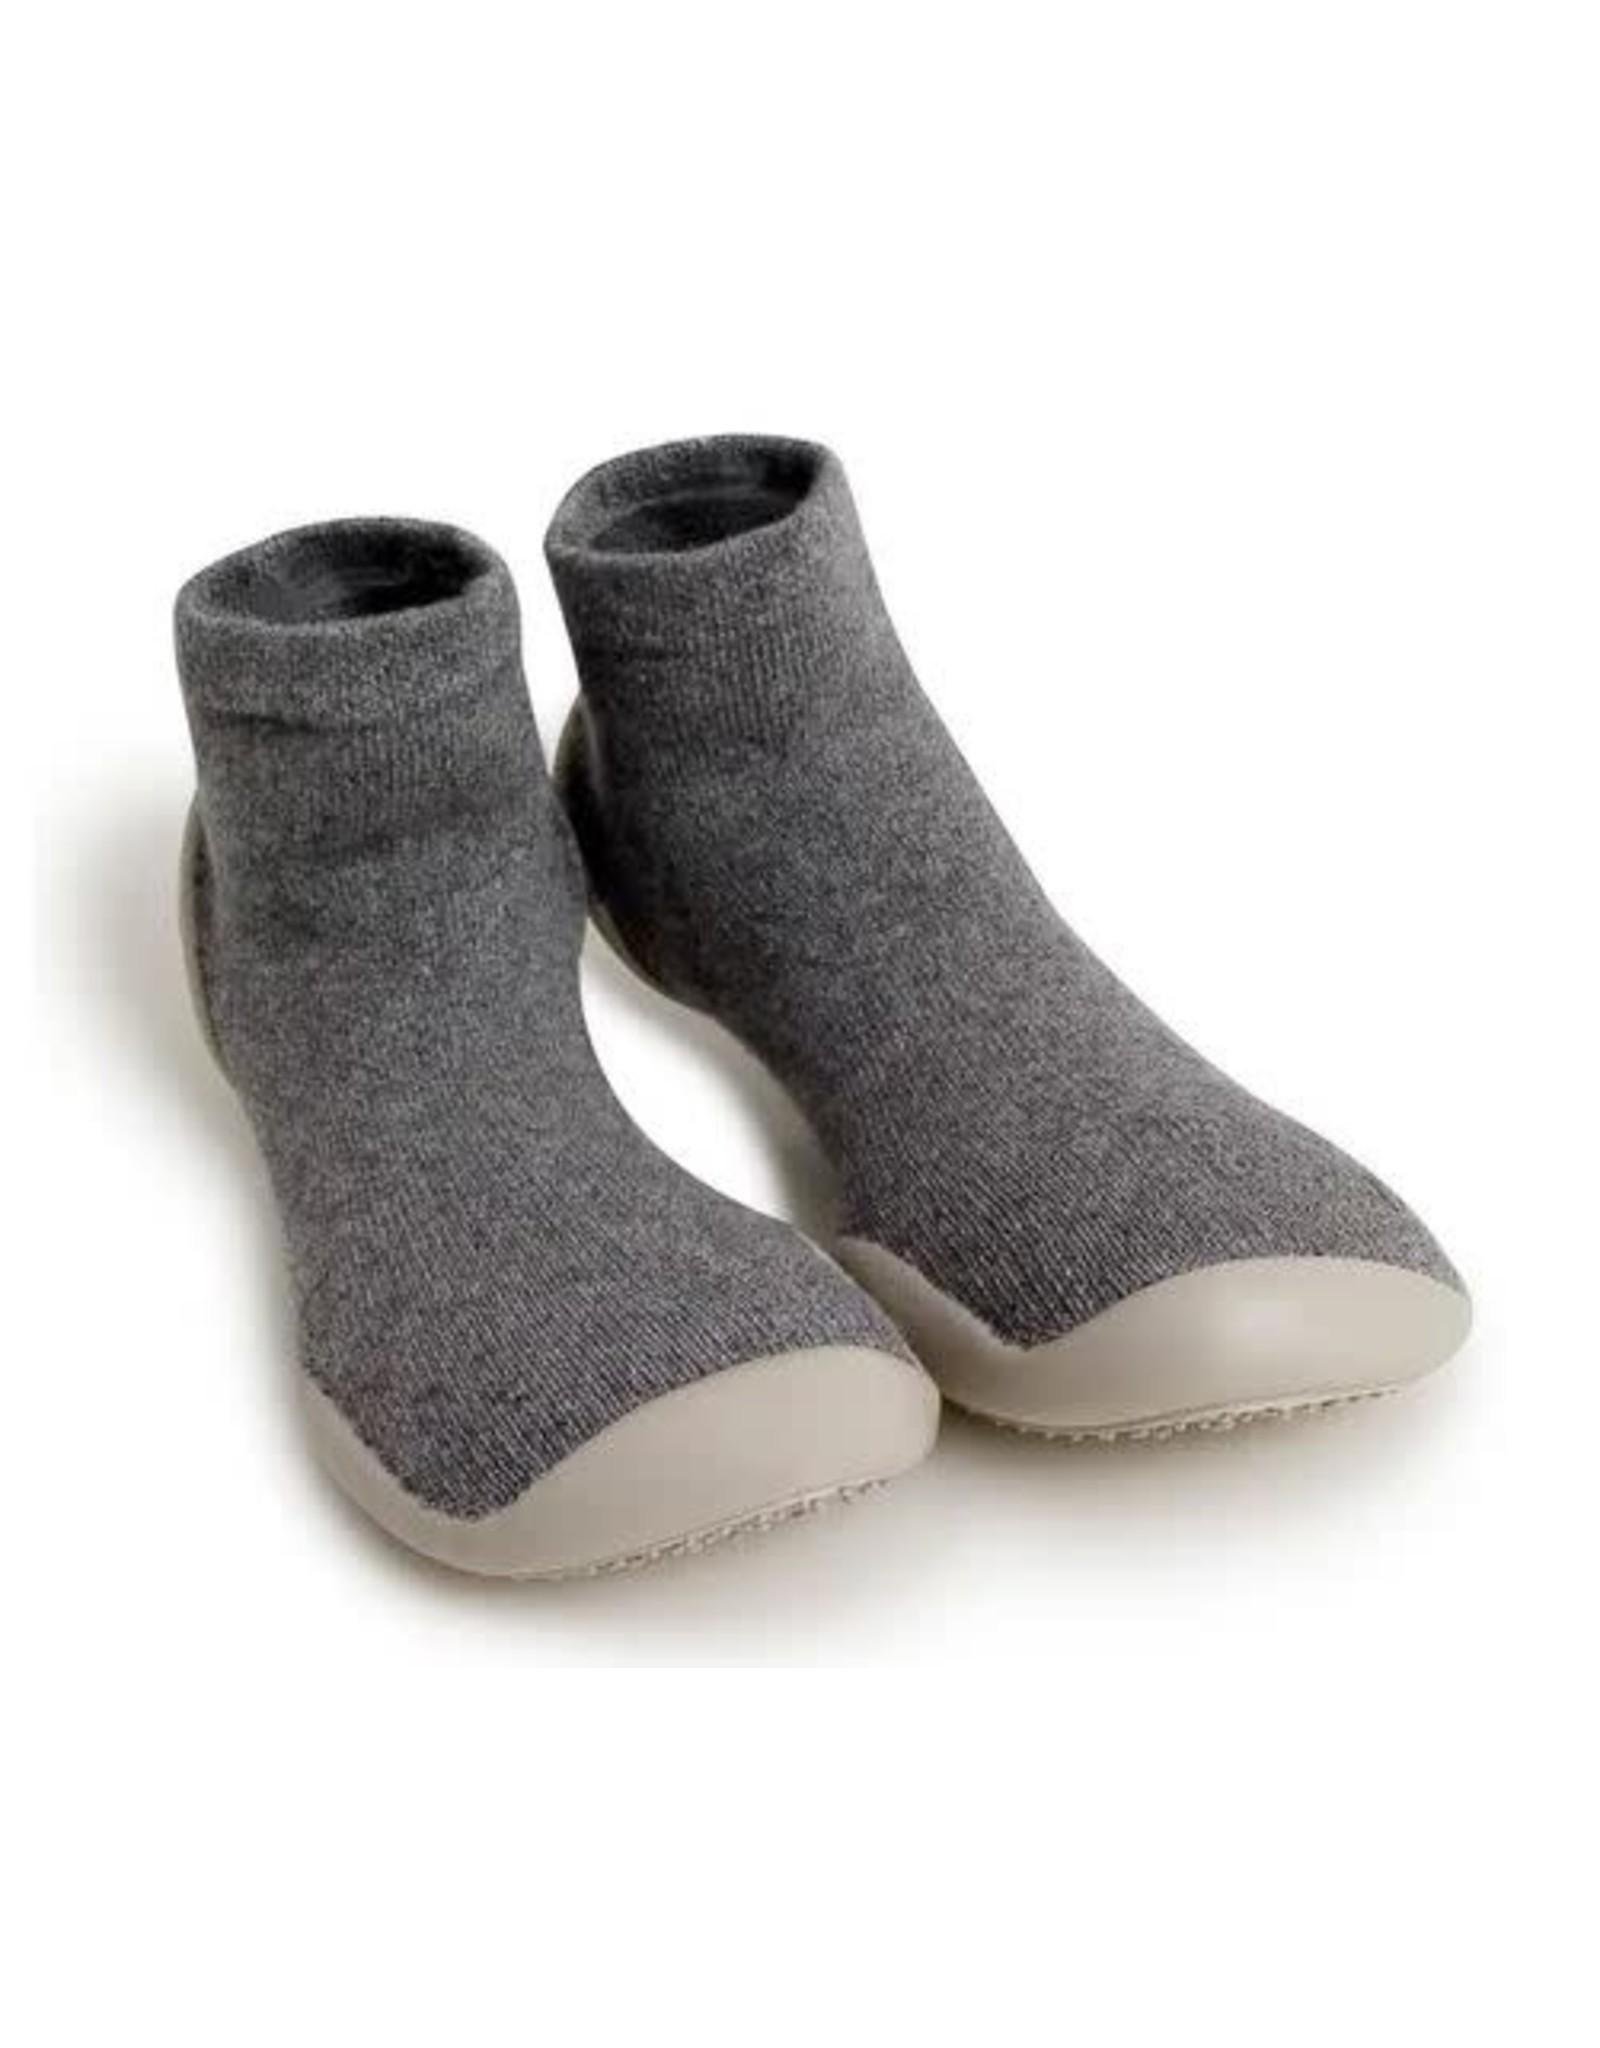 Collégien pantoffel grijs